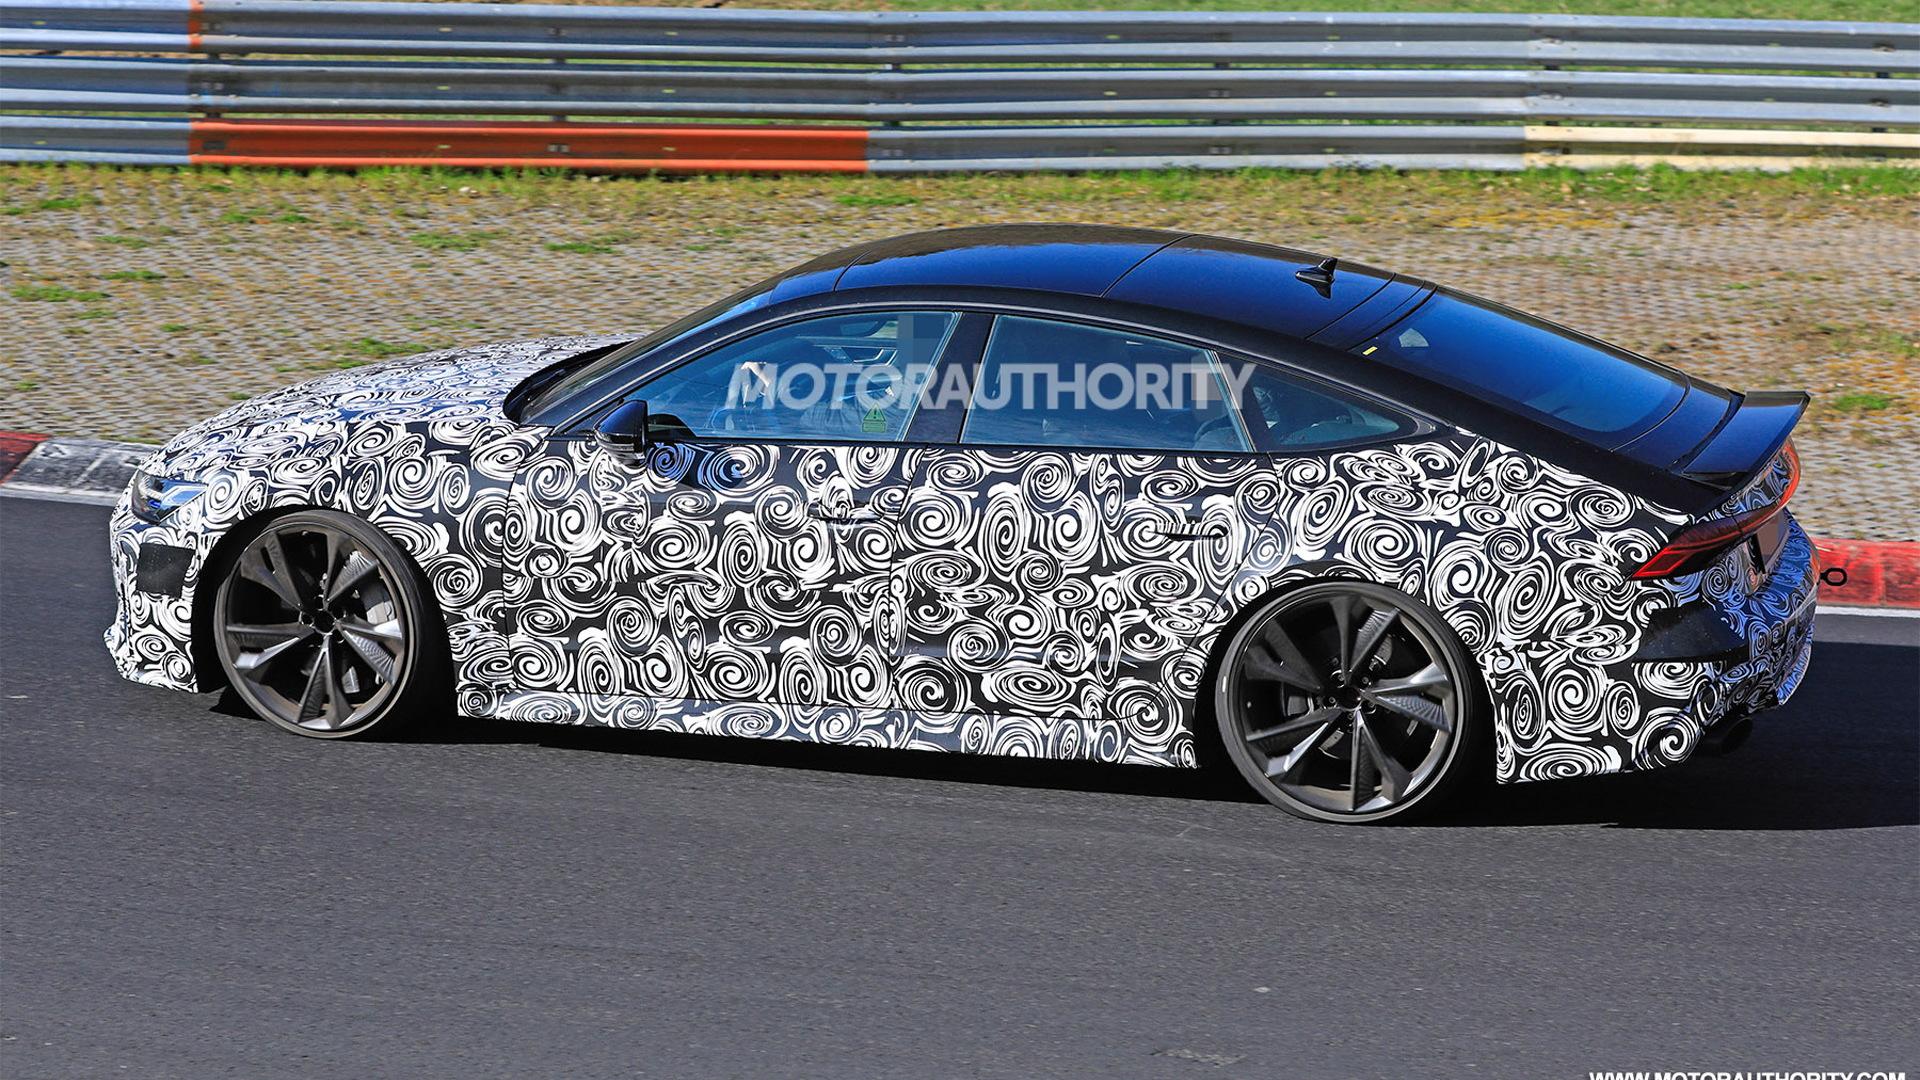 2020 Audi RS 7 Sportback spy shots - Image via S. Baldauf/SB-Medien